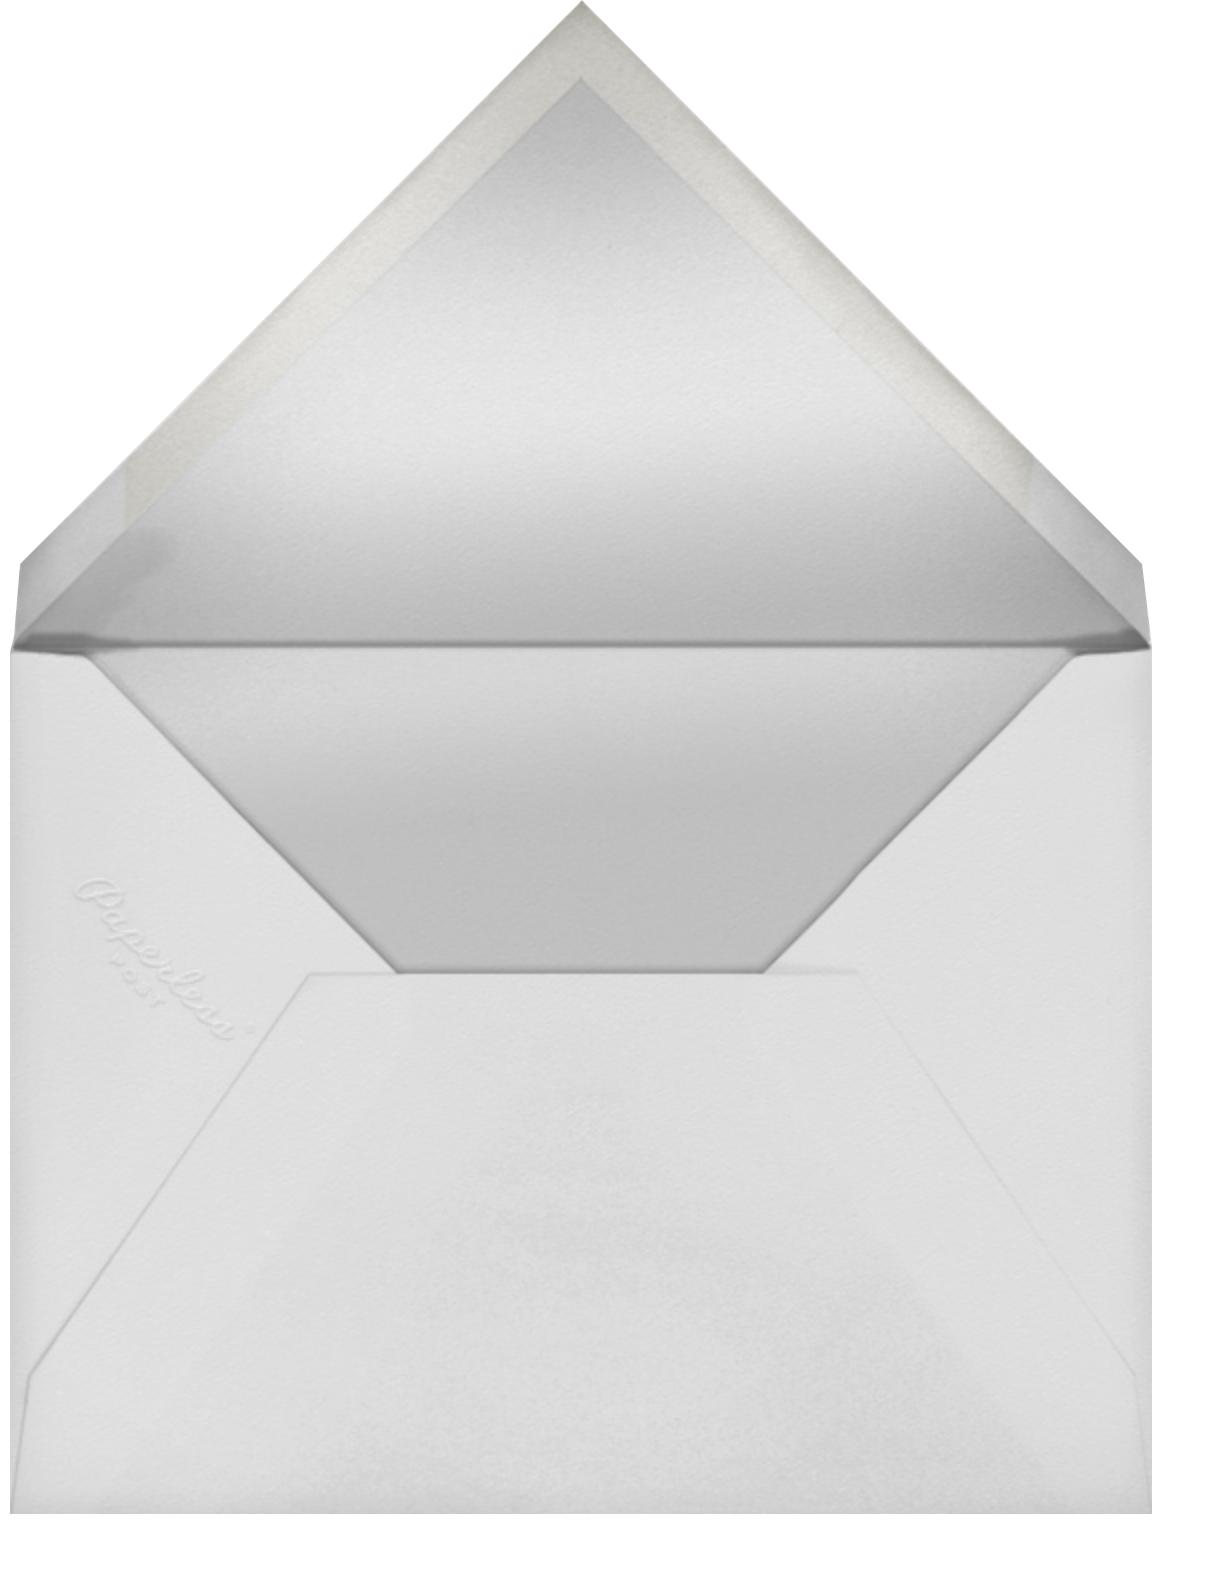 Lord Paisley Tana (Program) - Liberty - Envelope